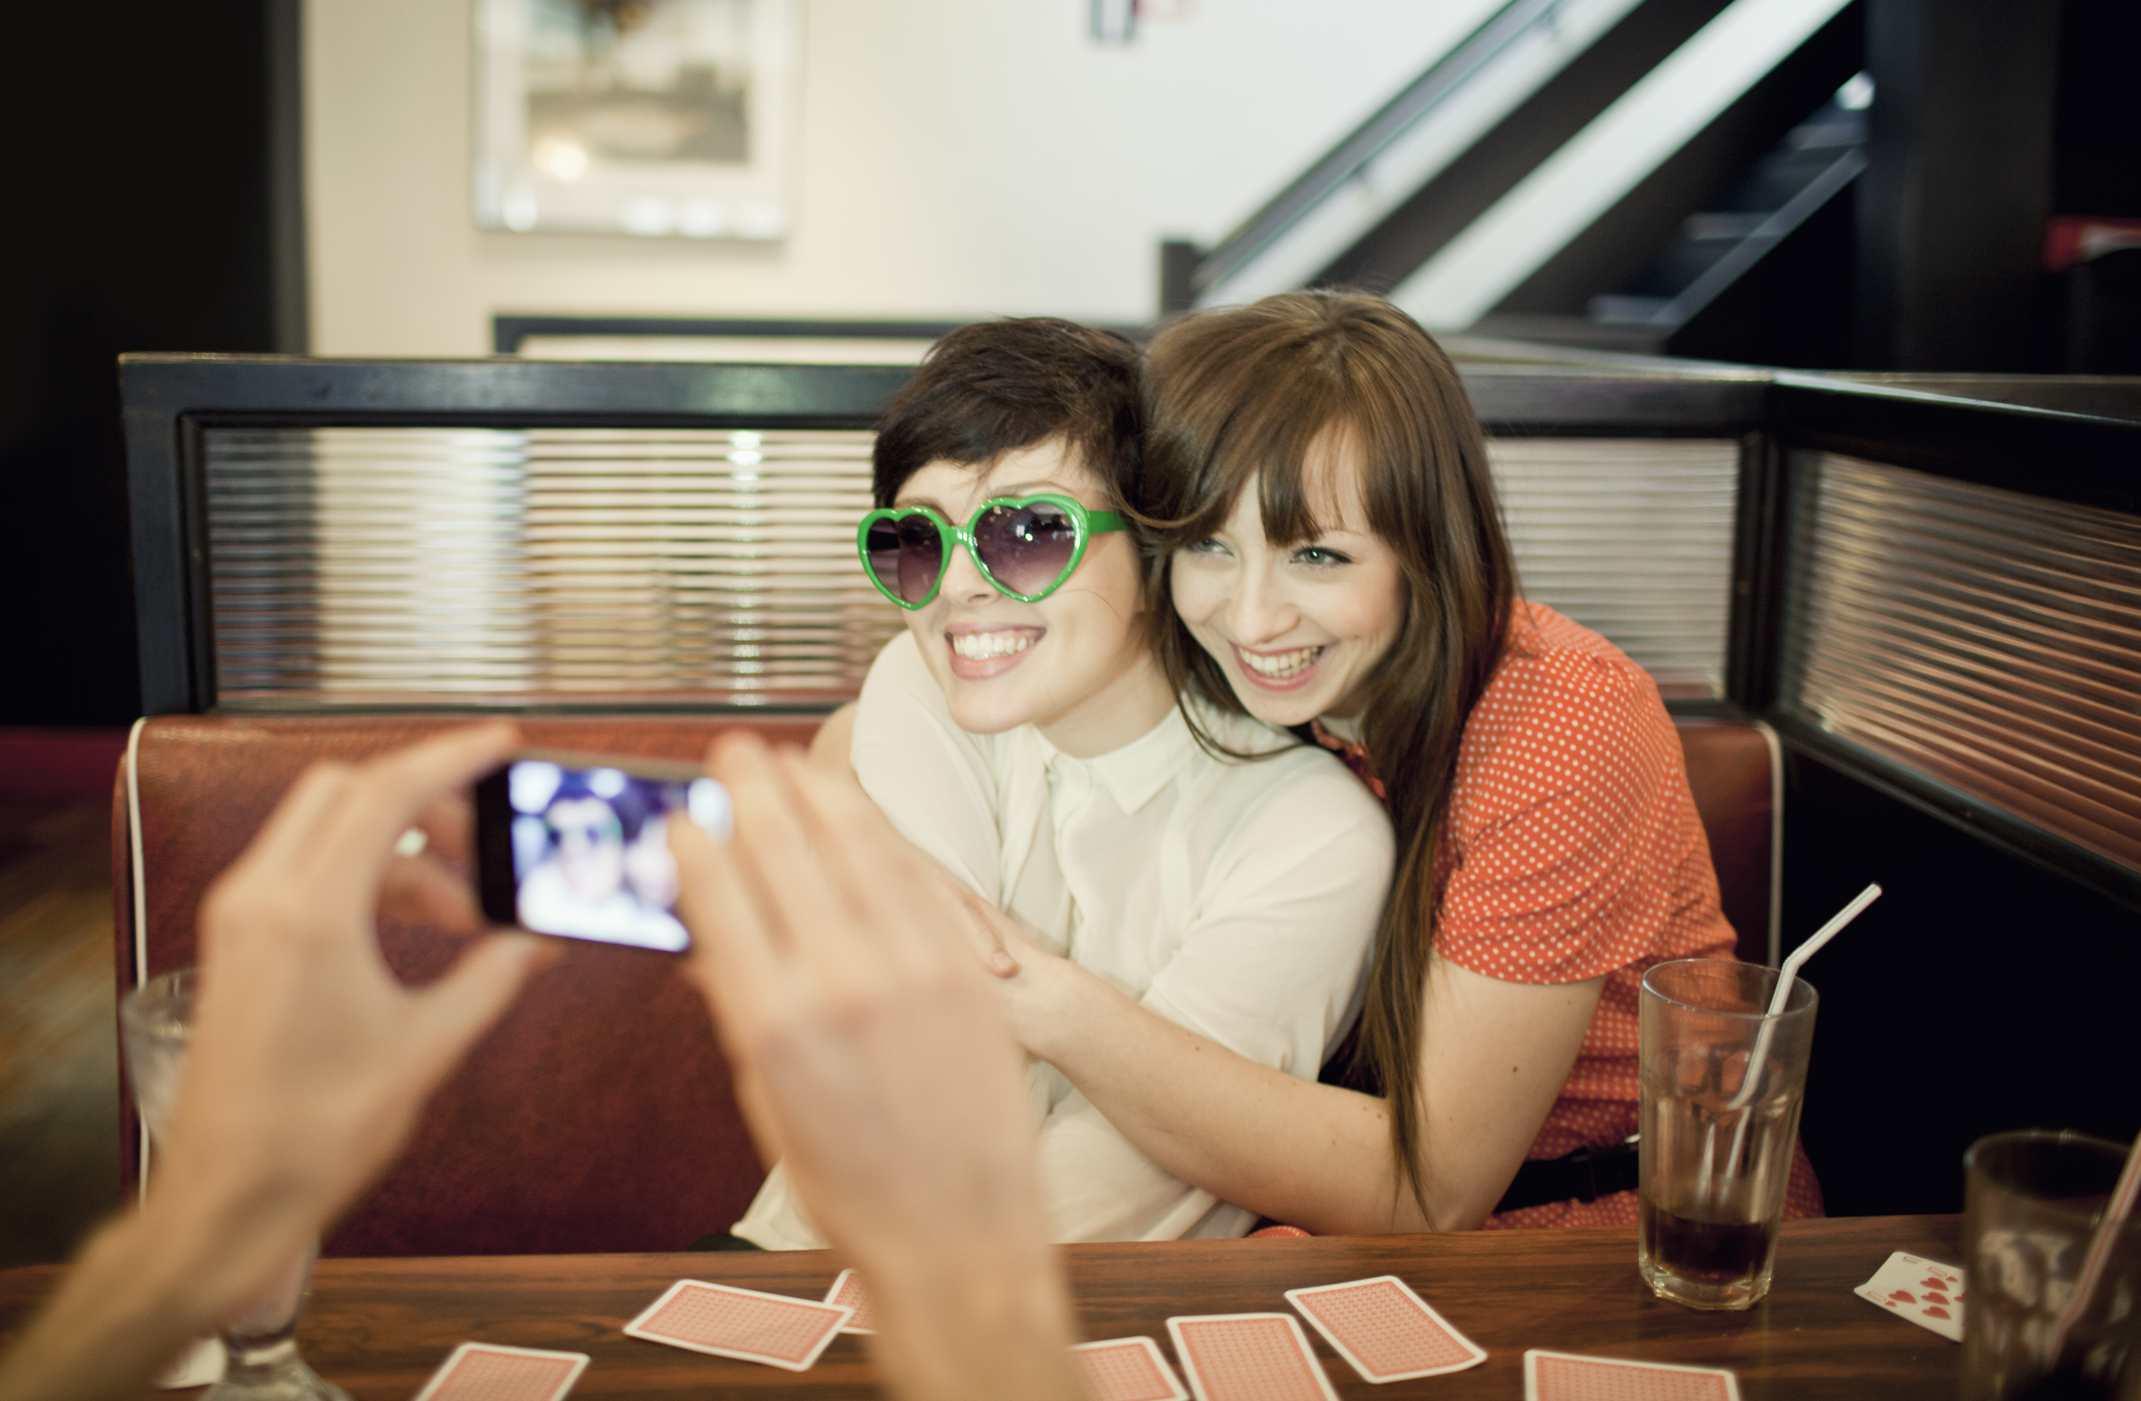 An image of two women having their photo taken.